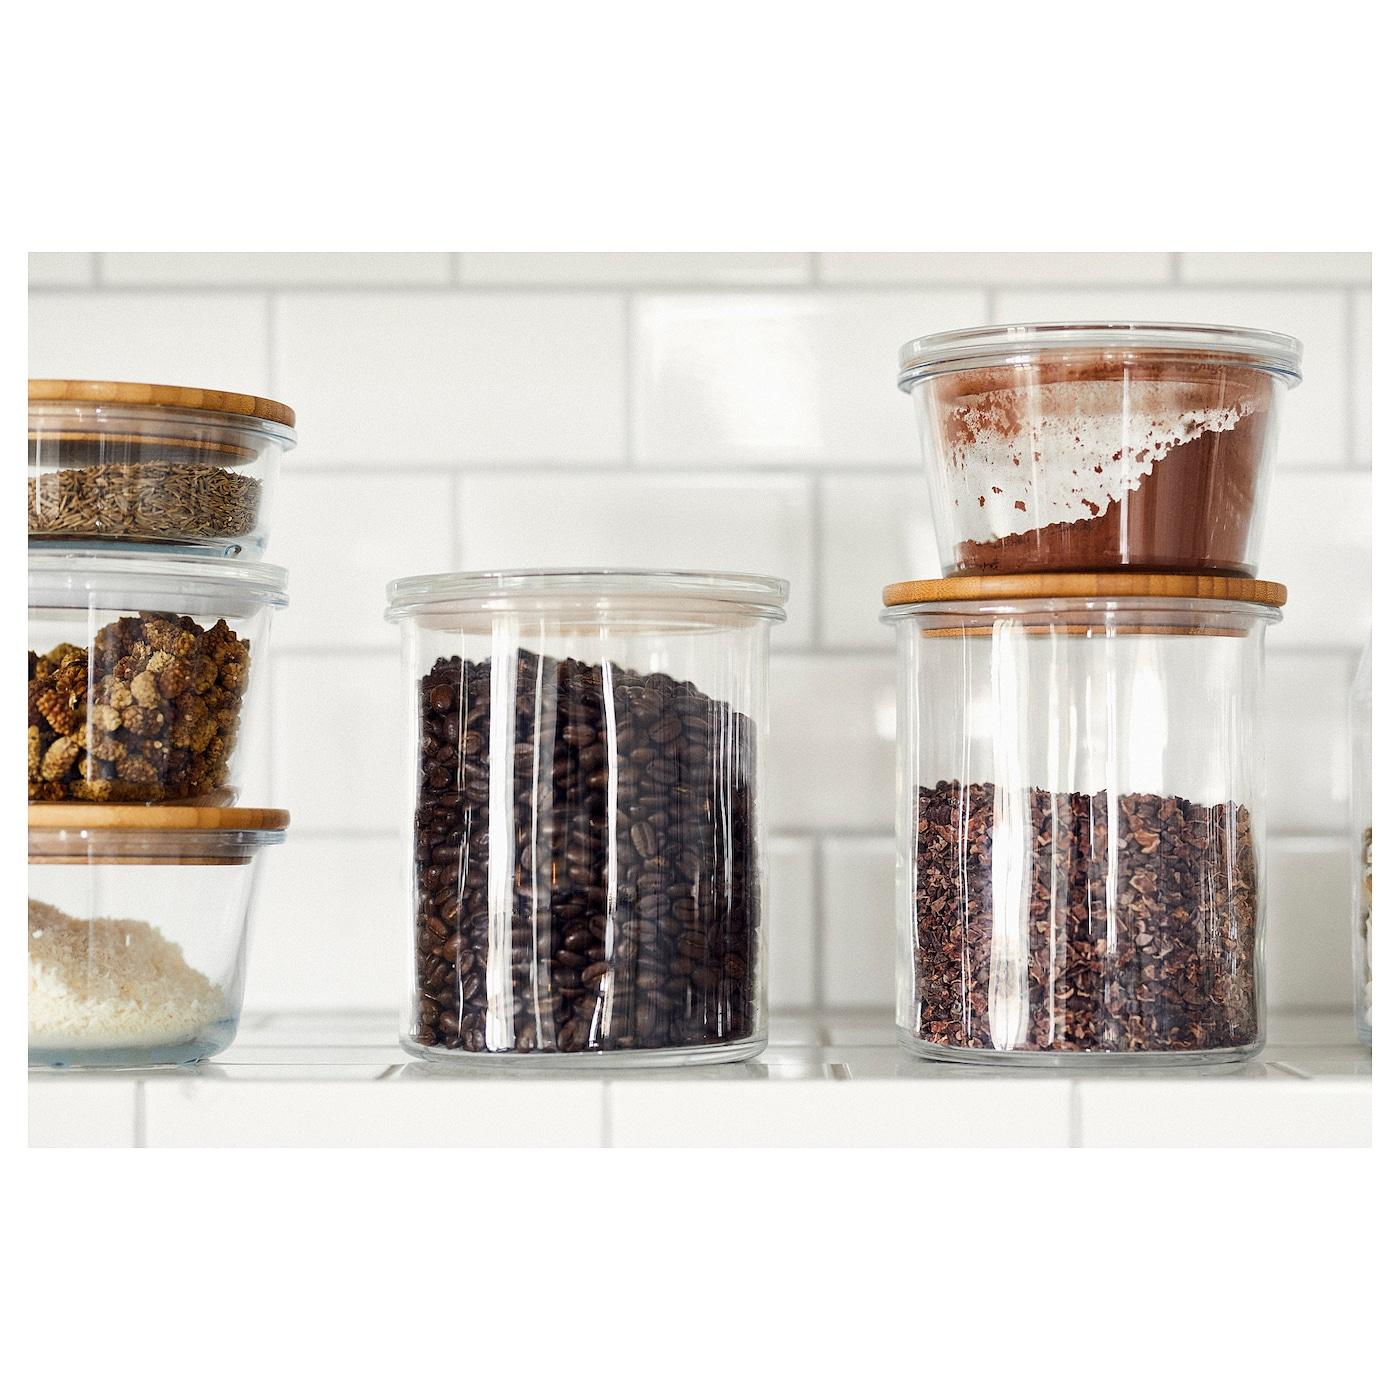 IKEA 9+ Jar with lid - glass/bamboo 9.9 l